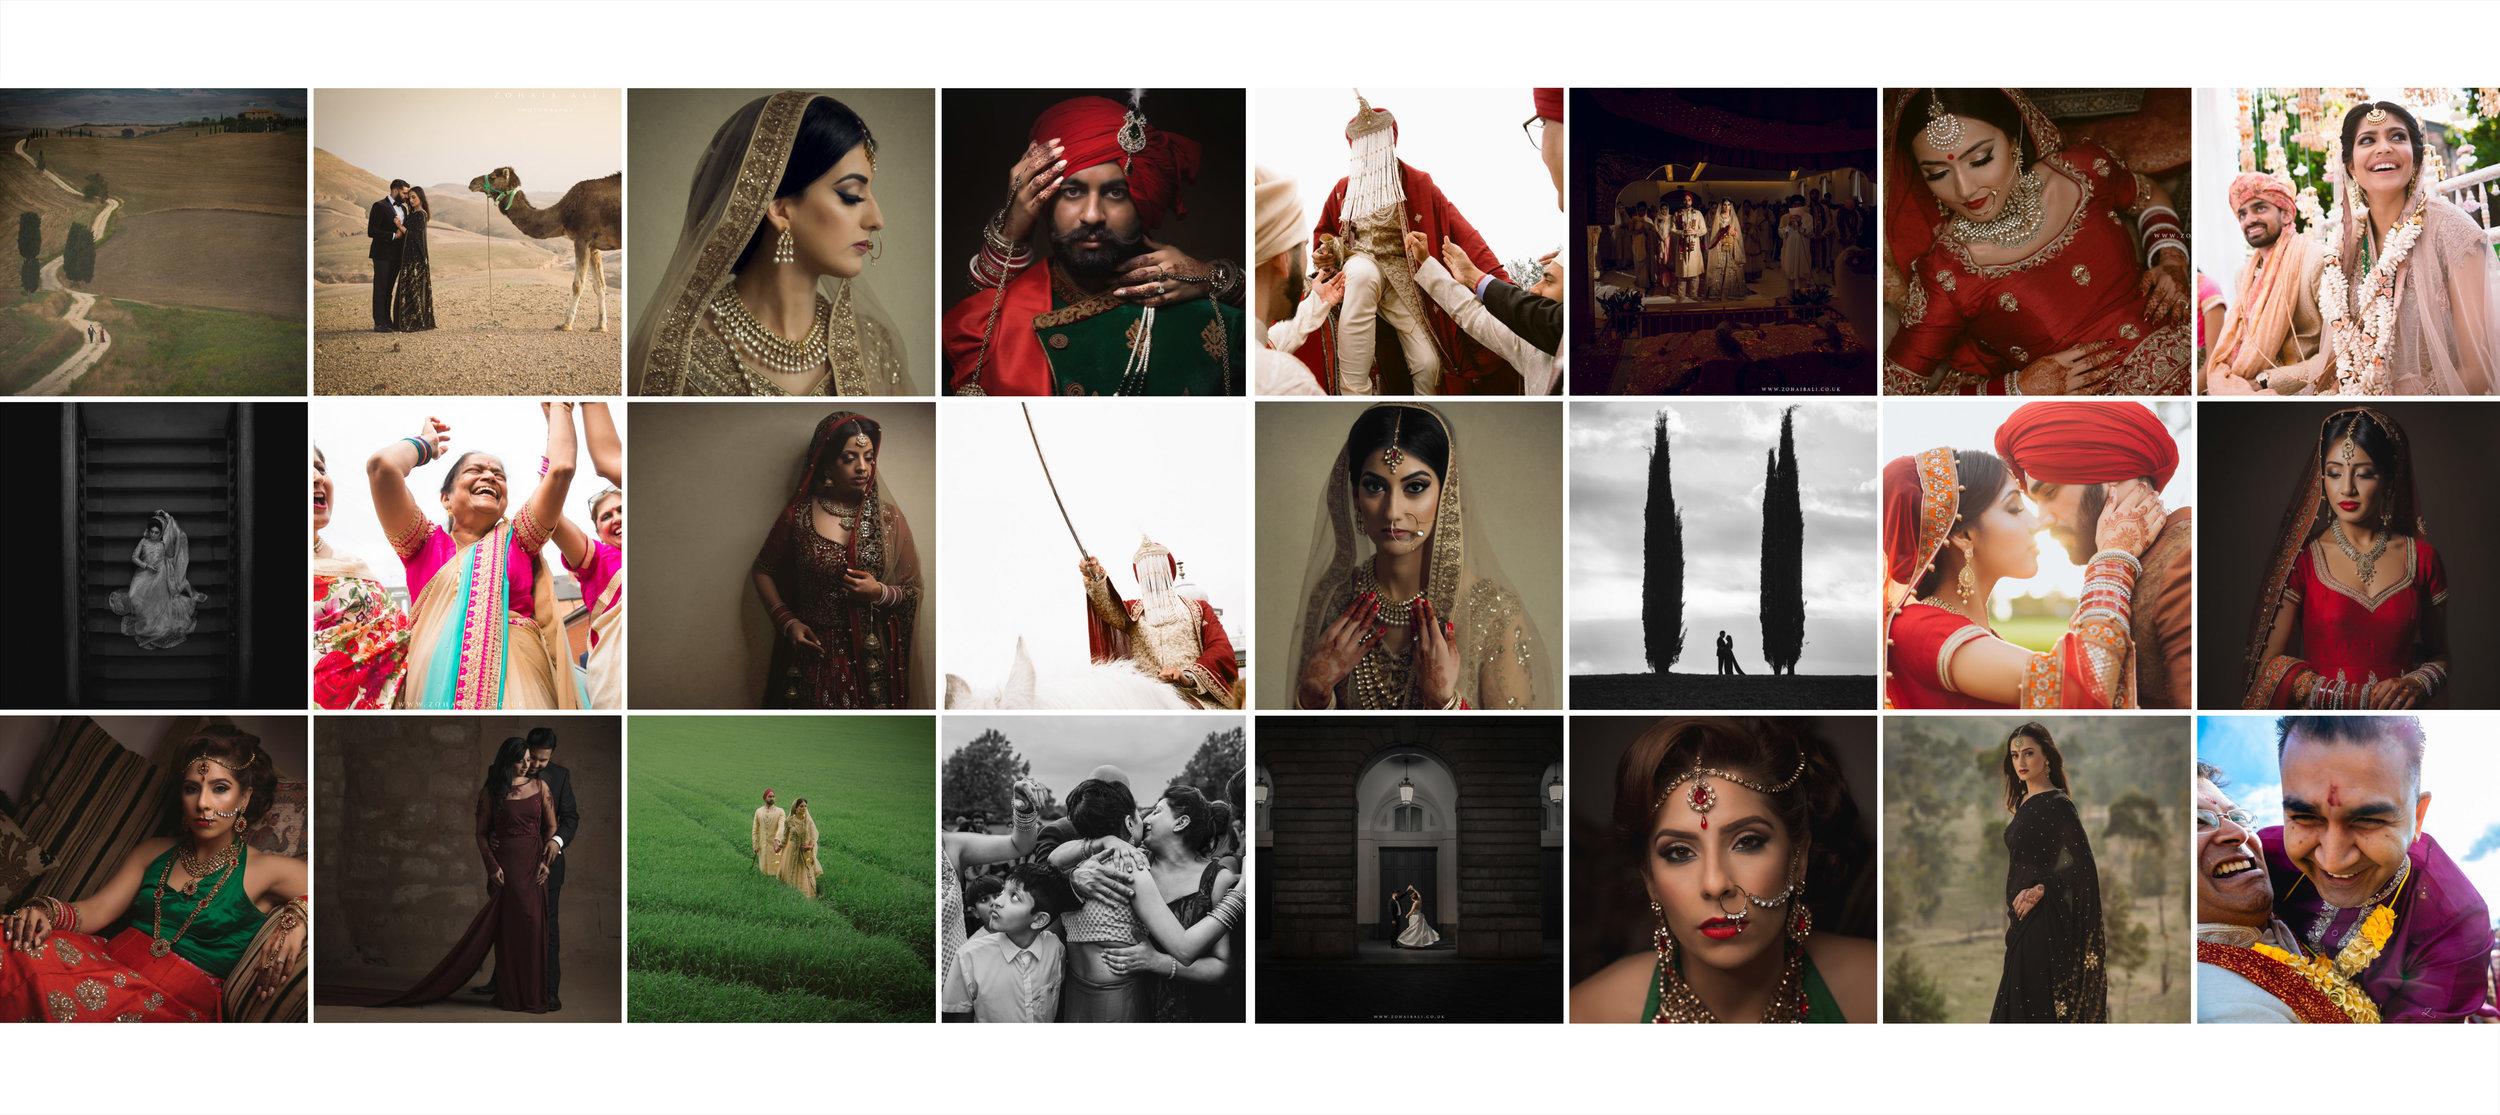 Indian Wedding Photography Inspiration.jpg